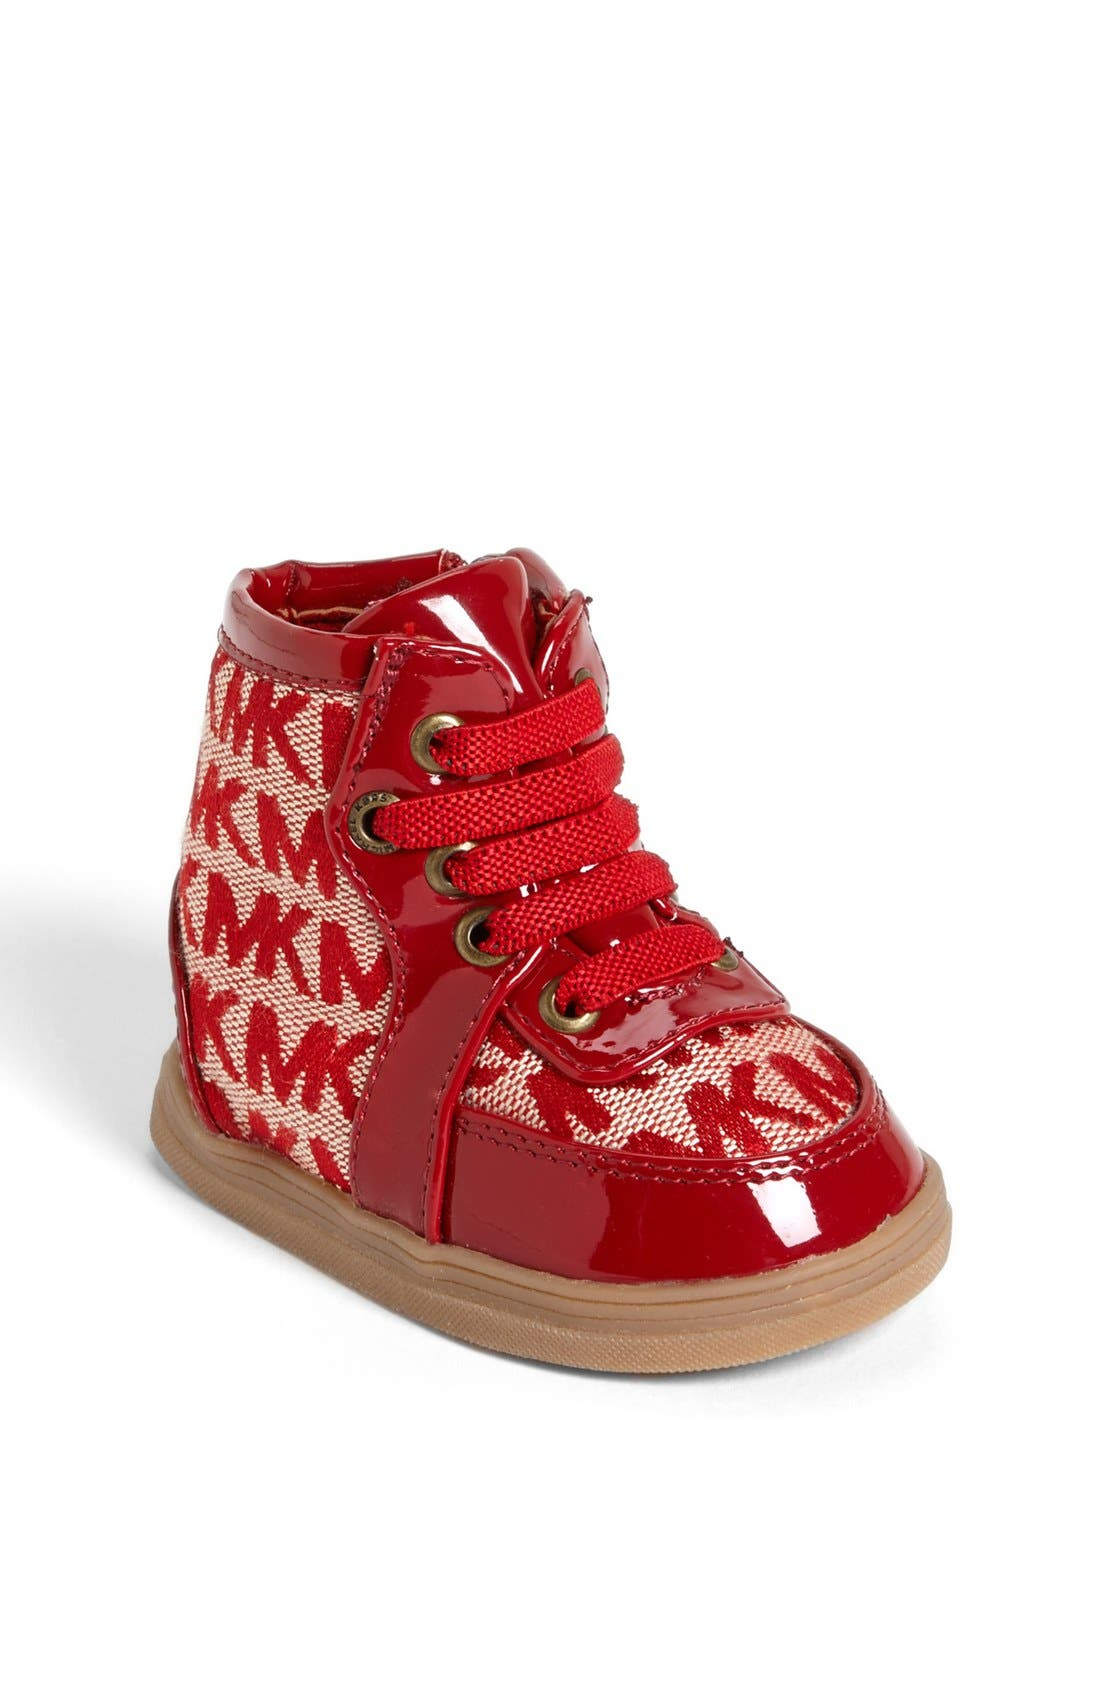 Alternate Image 1 Selected - MICHAEL Michael Kors 'Ivy' Crib Shoe (Baby)